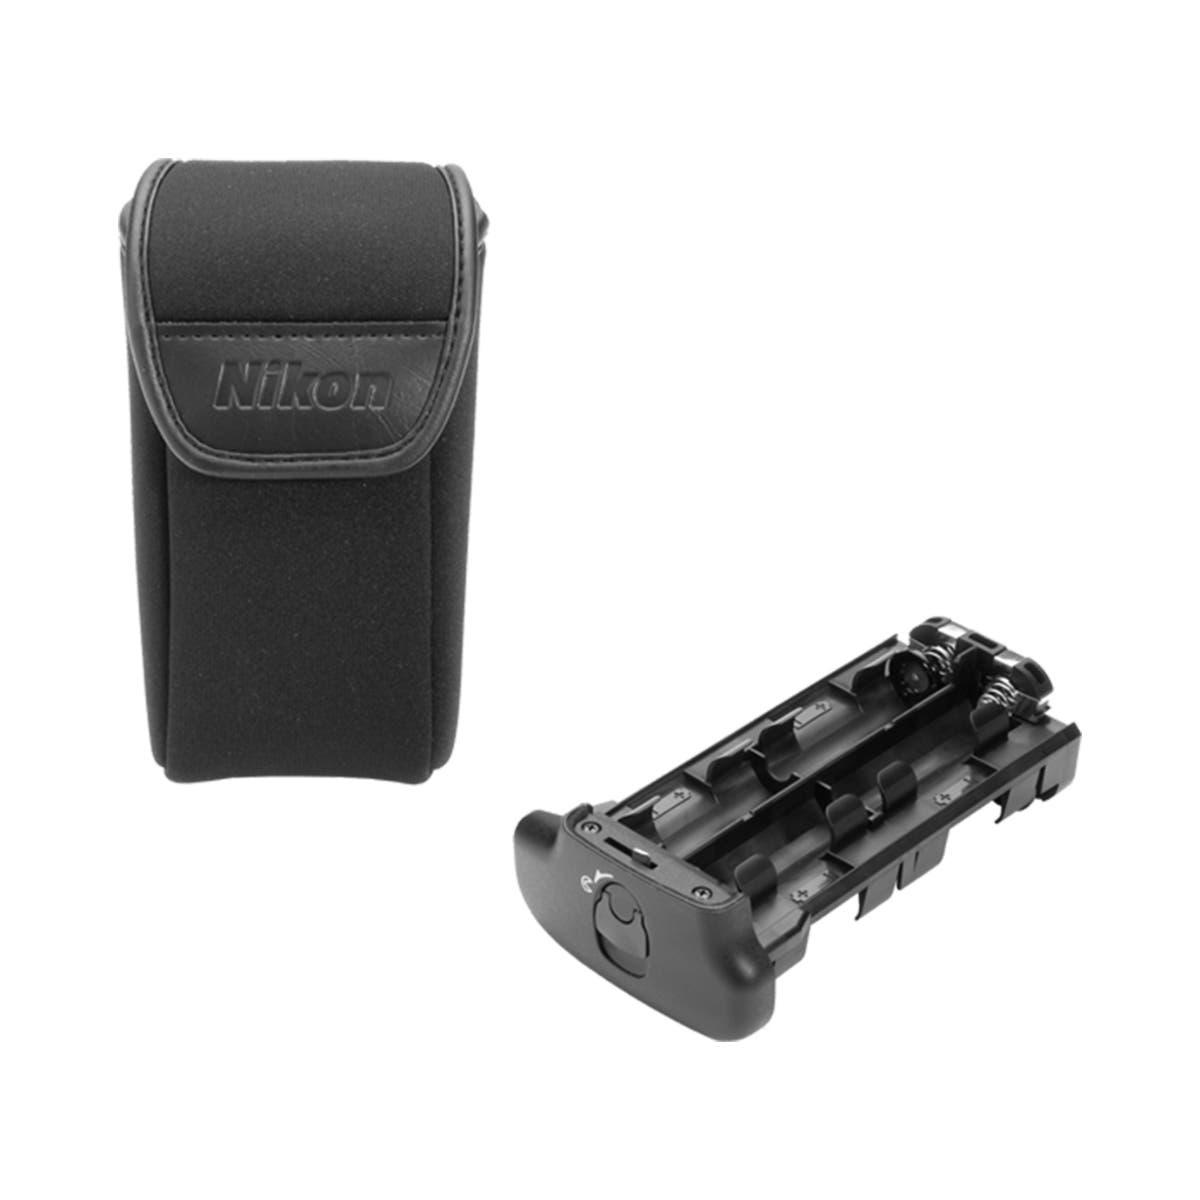 MS-41 AA Battery Holder